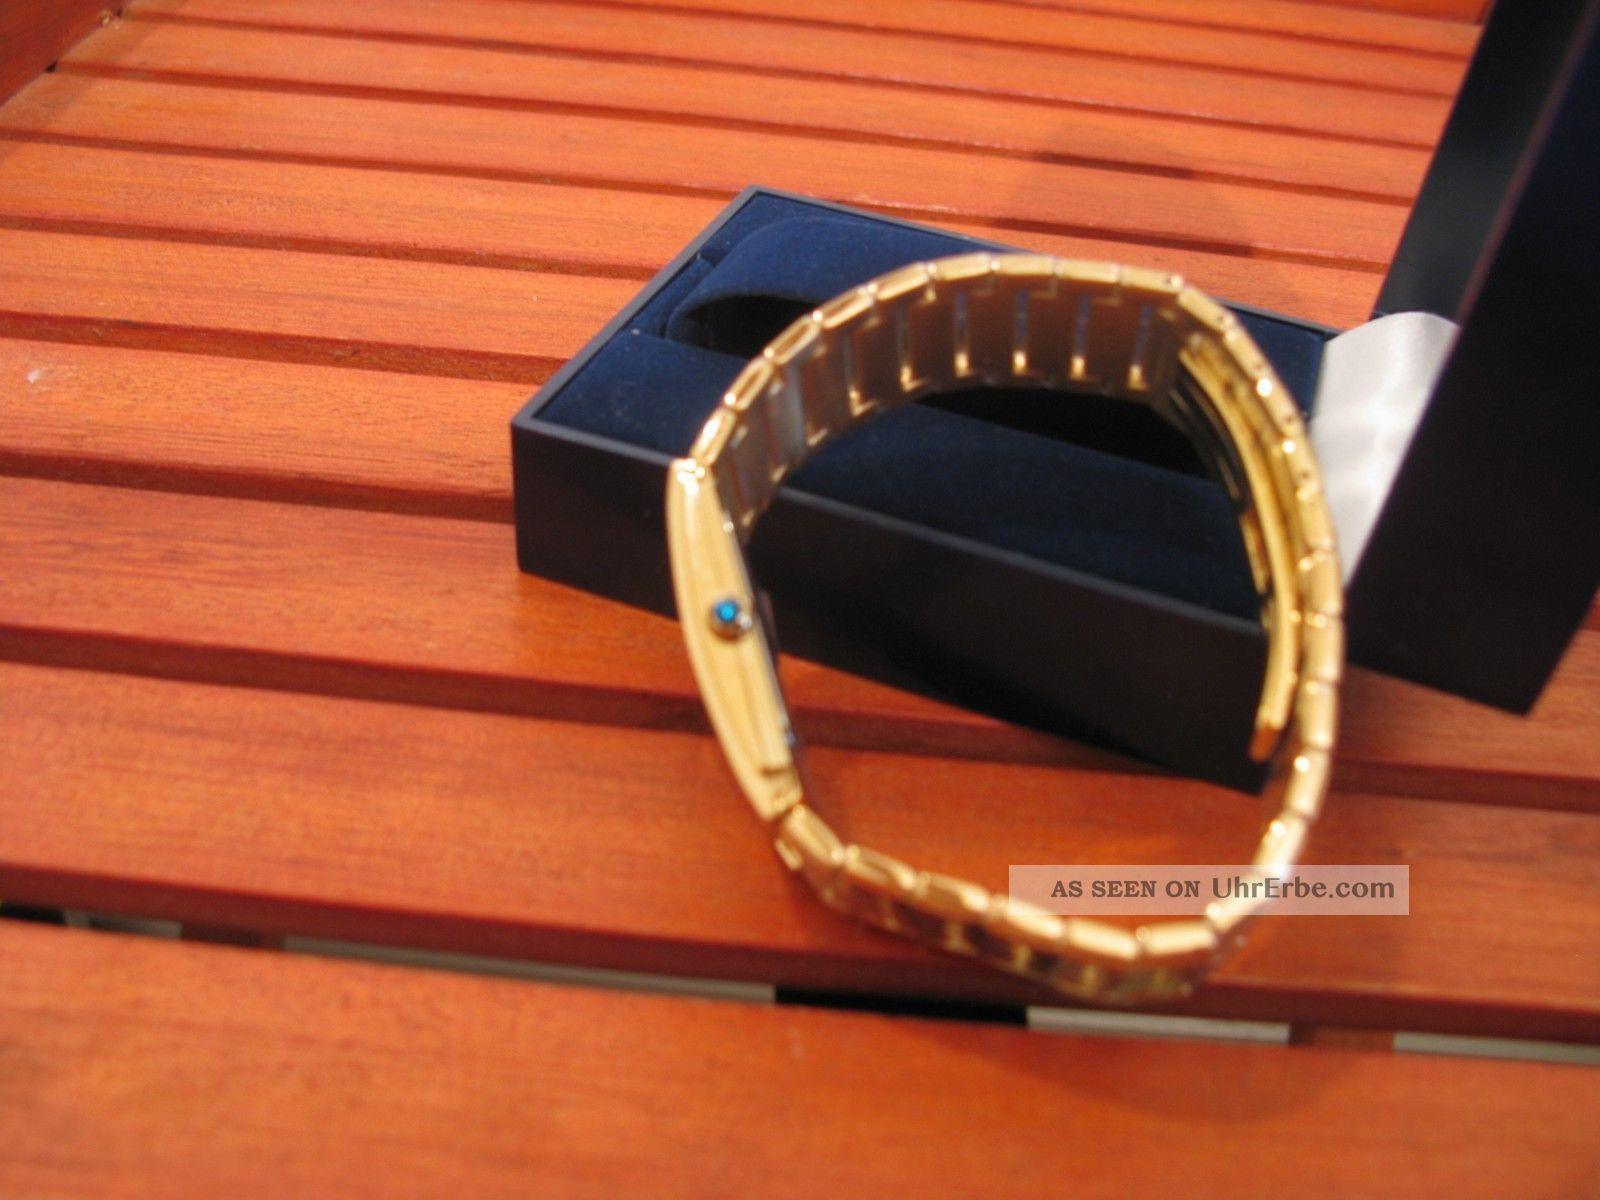 Splendor Uhren centia switzerland quartz armbanduhr splendor sa ovp unbedingt anschauen